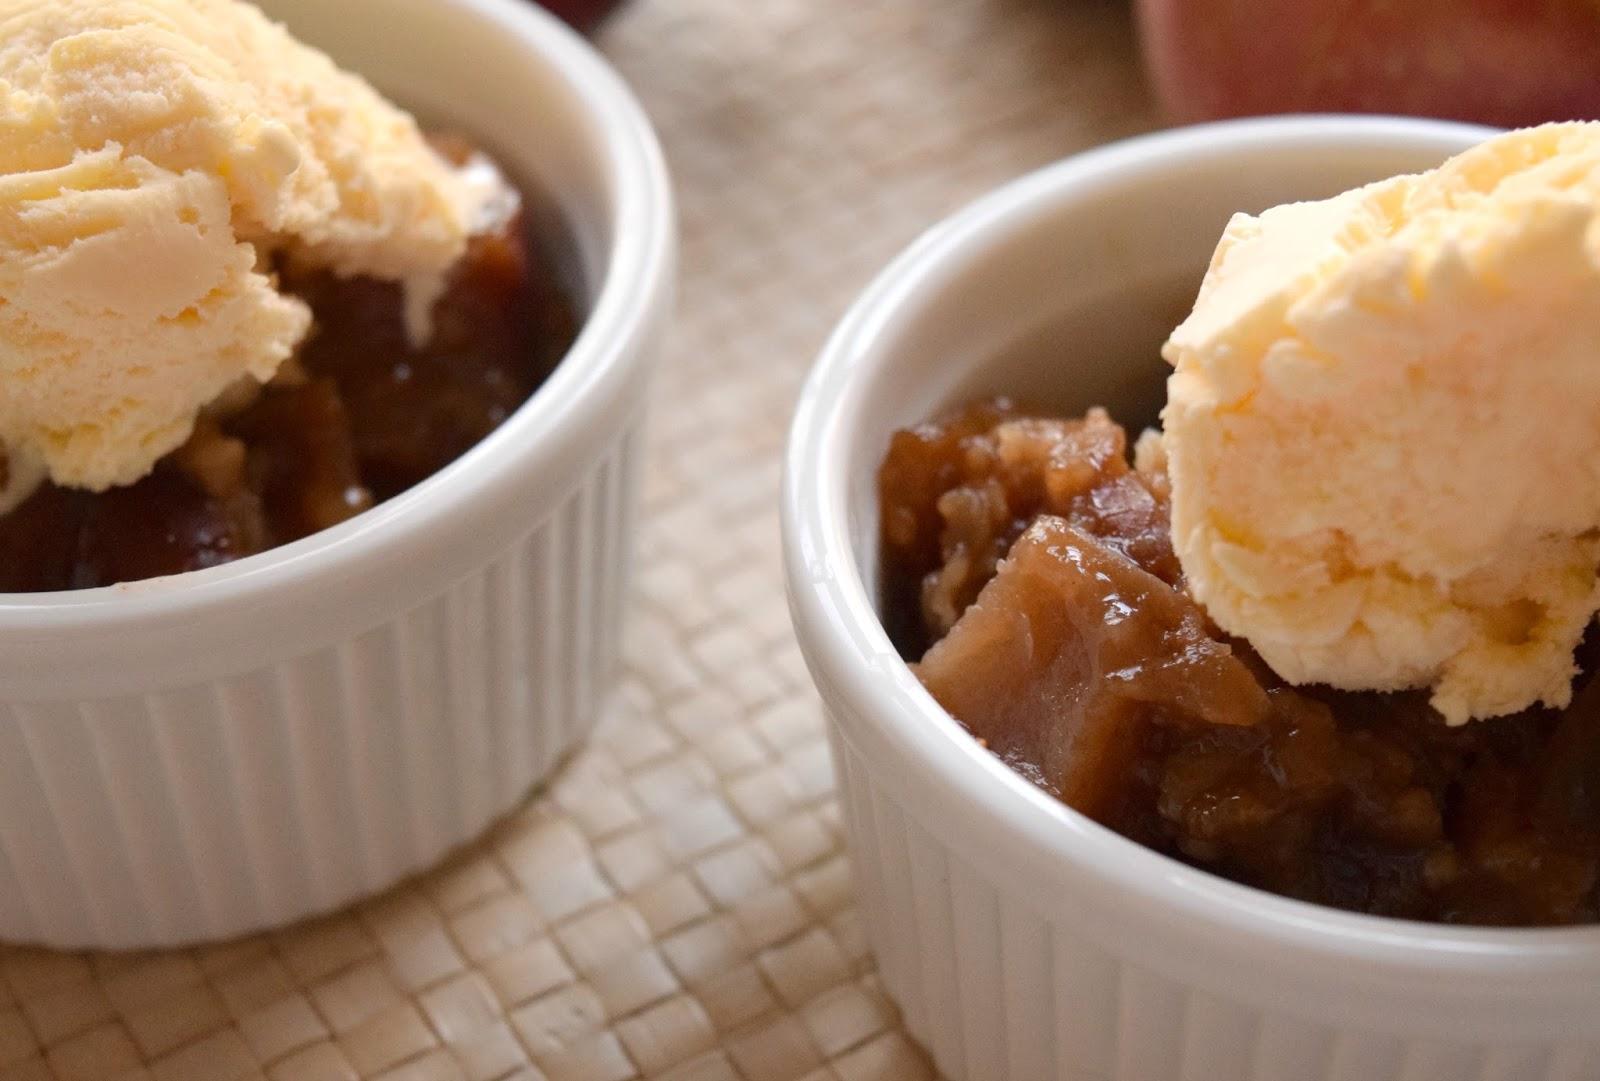 crockpot apple crumble - slow cooker apple recipe - apple crumble - crockpot fall recipe